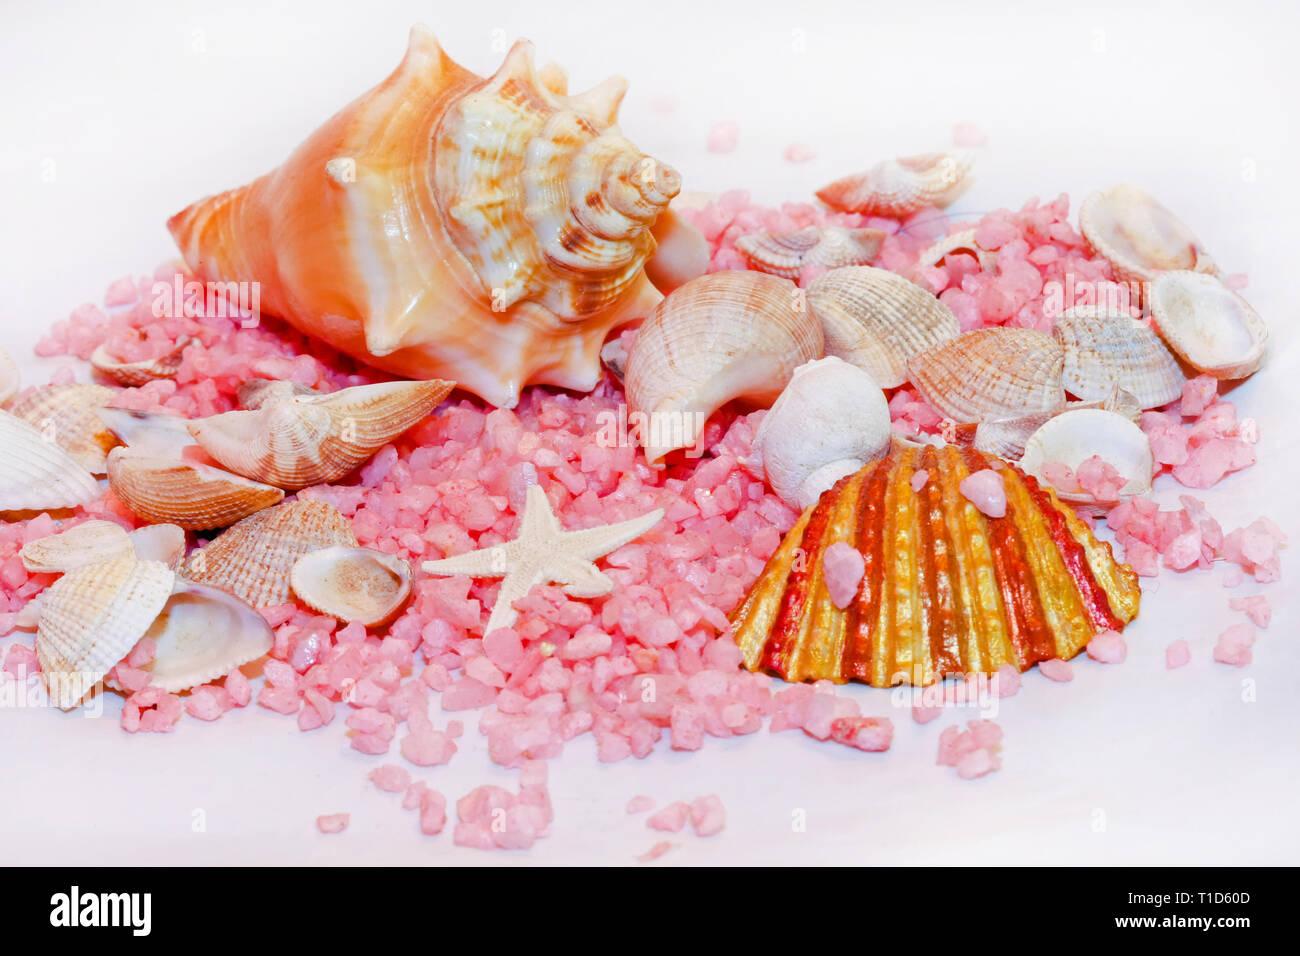 Seashells marine life decoration with pink stones - Stock Image